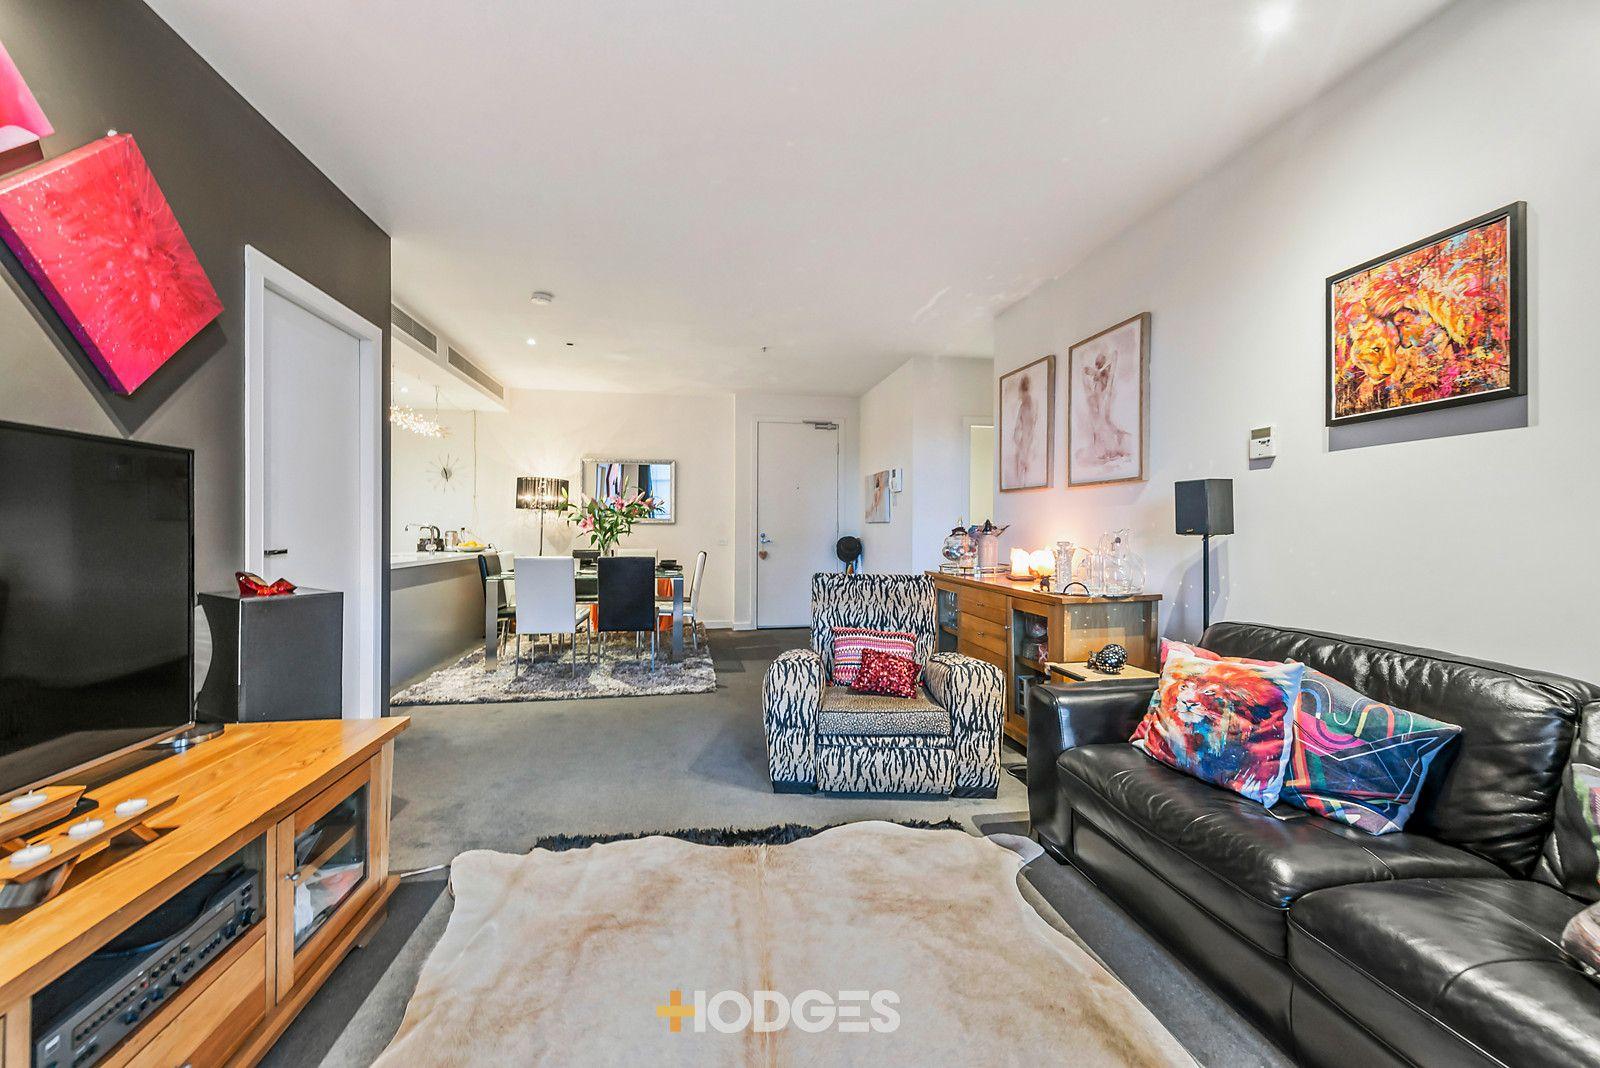 117/55 Queens Road, Melbourne 3004 VIC 3004, Image 1